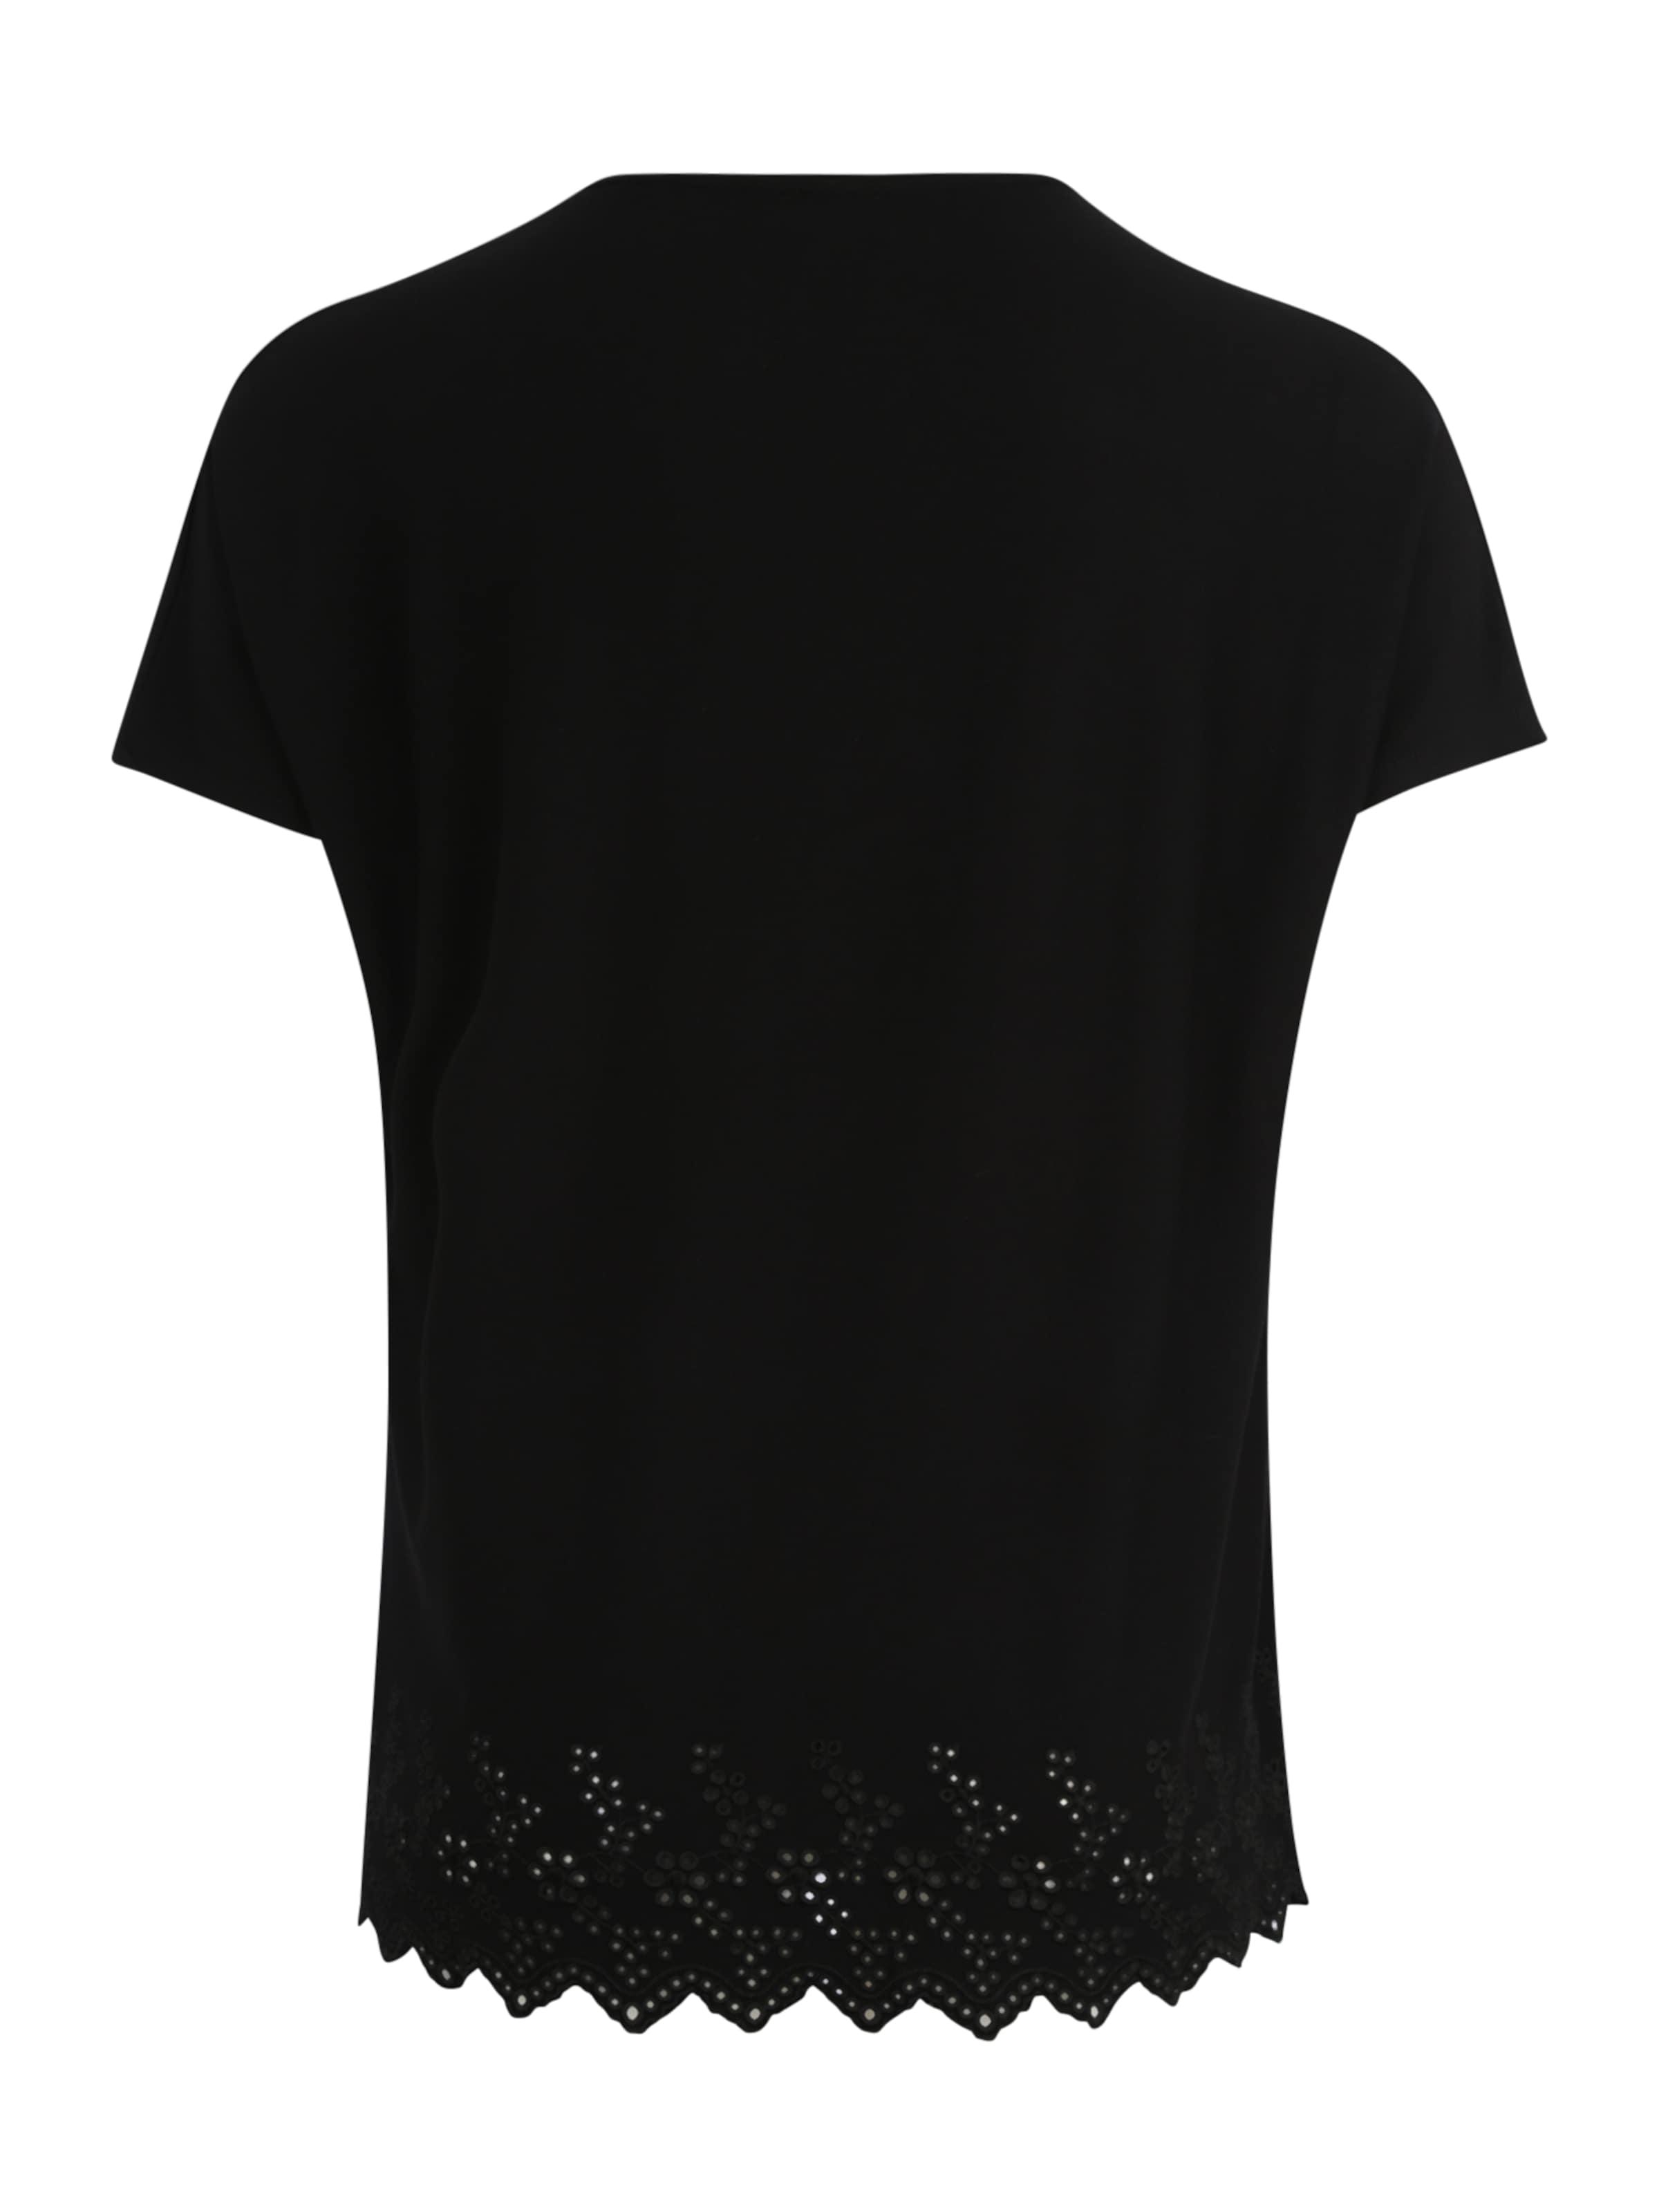 Noir shirt Triangle En En shirt En T Triangle Noir T Triangle shirt T OZPiwkXuTl